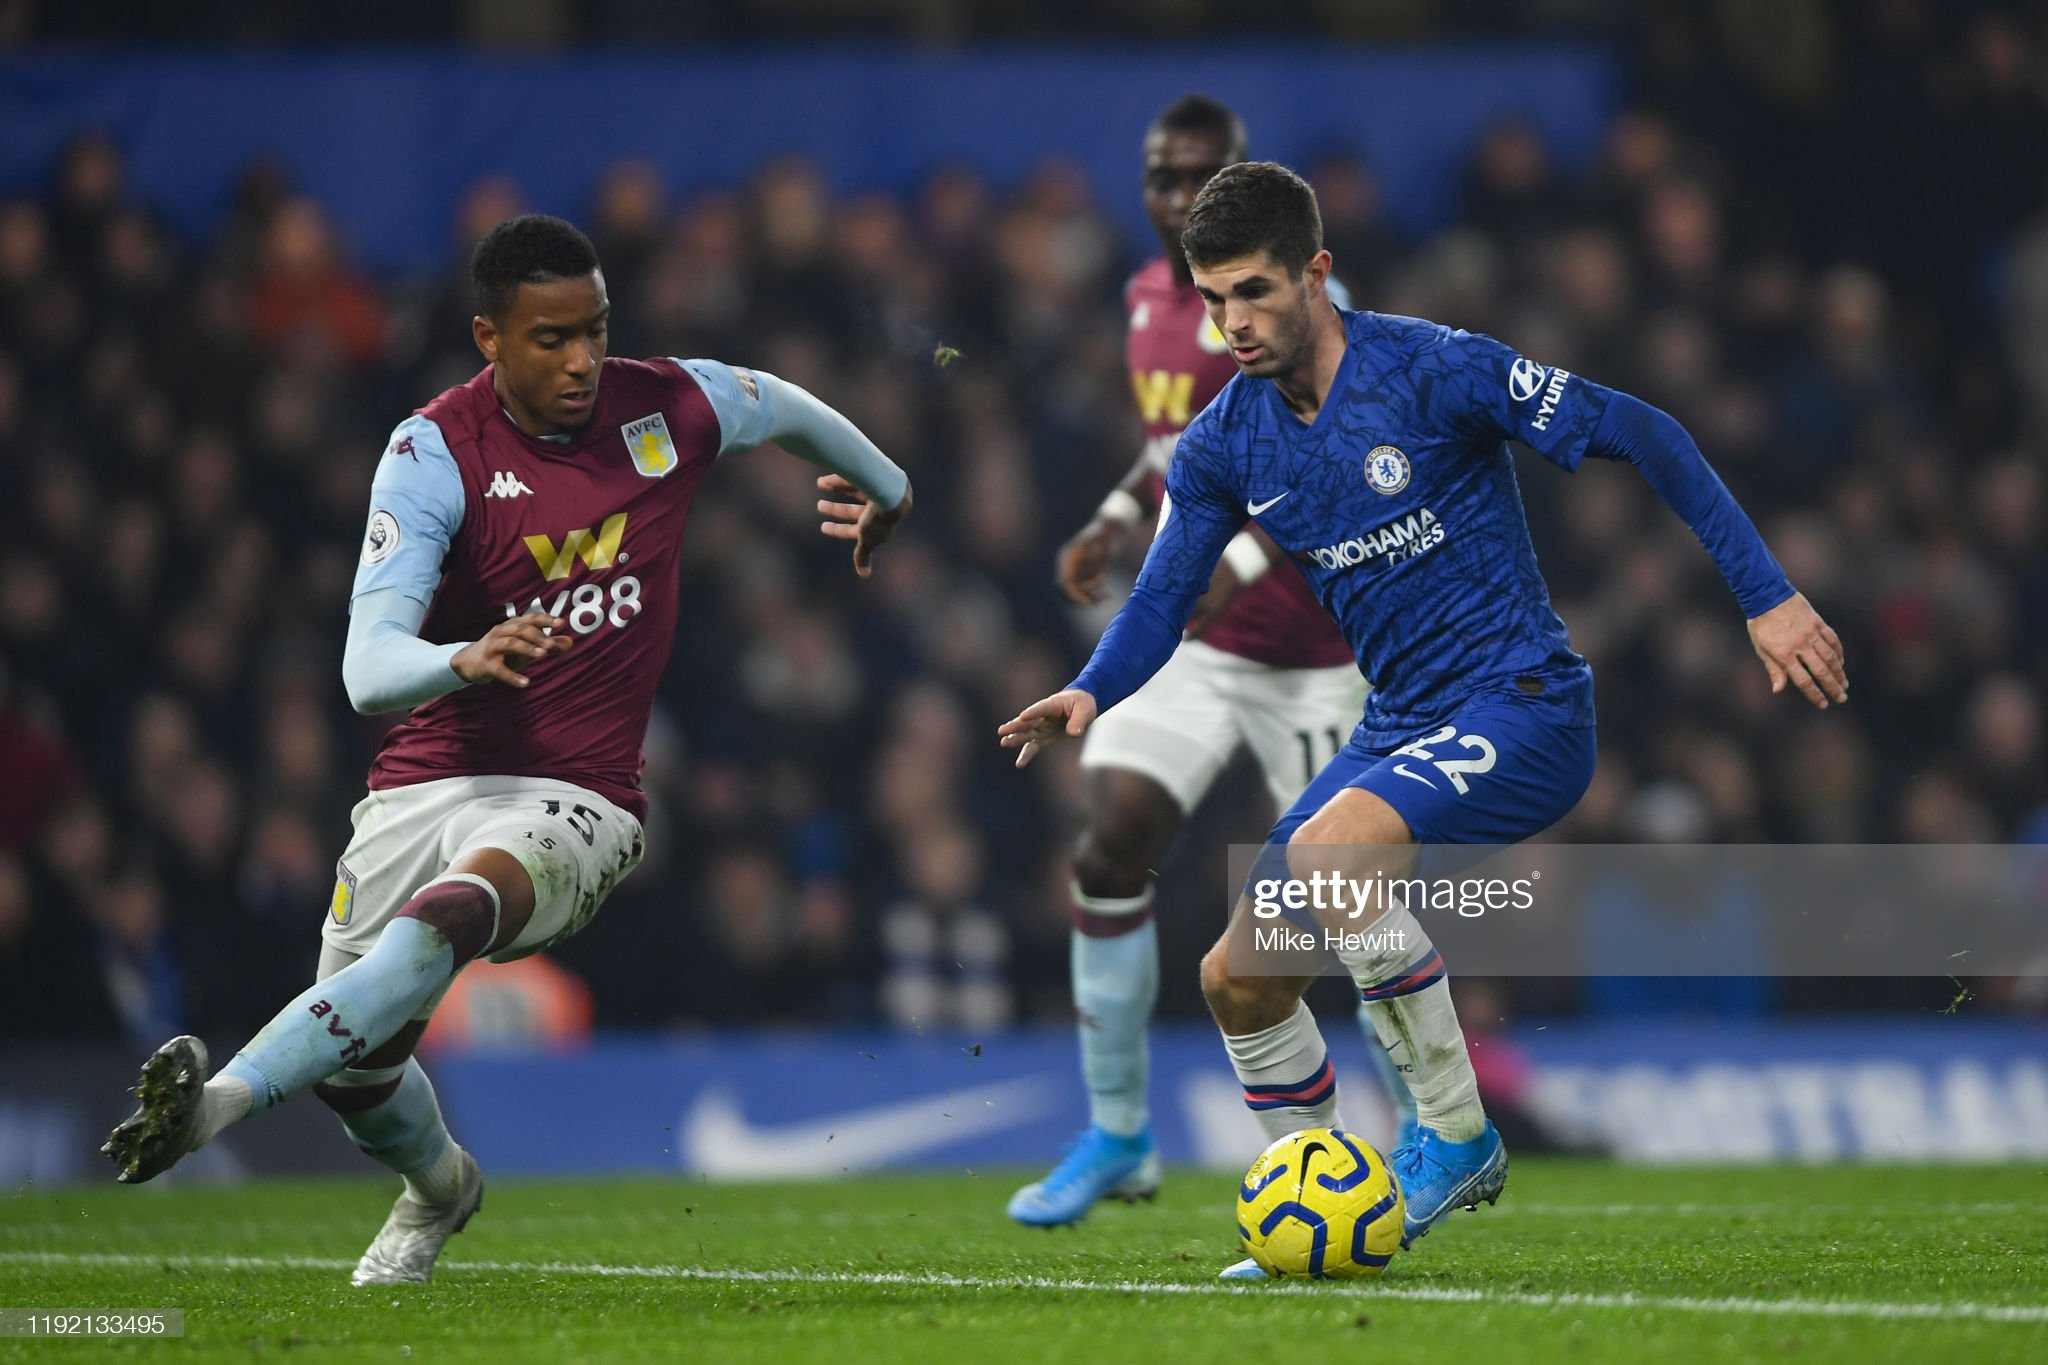 Aston Villa v Chelsea Preview, prediction and odds